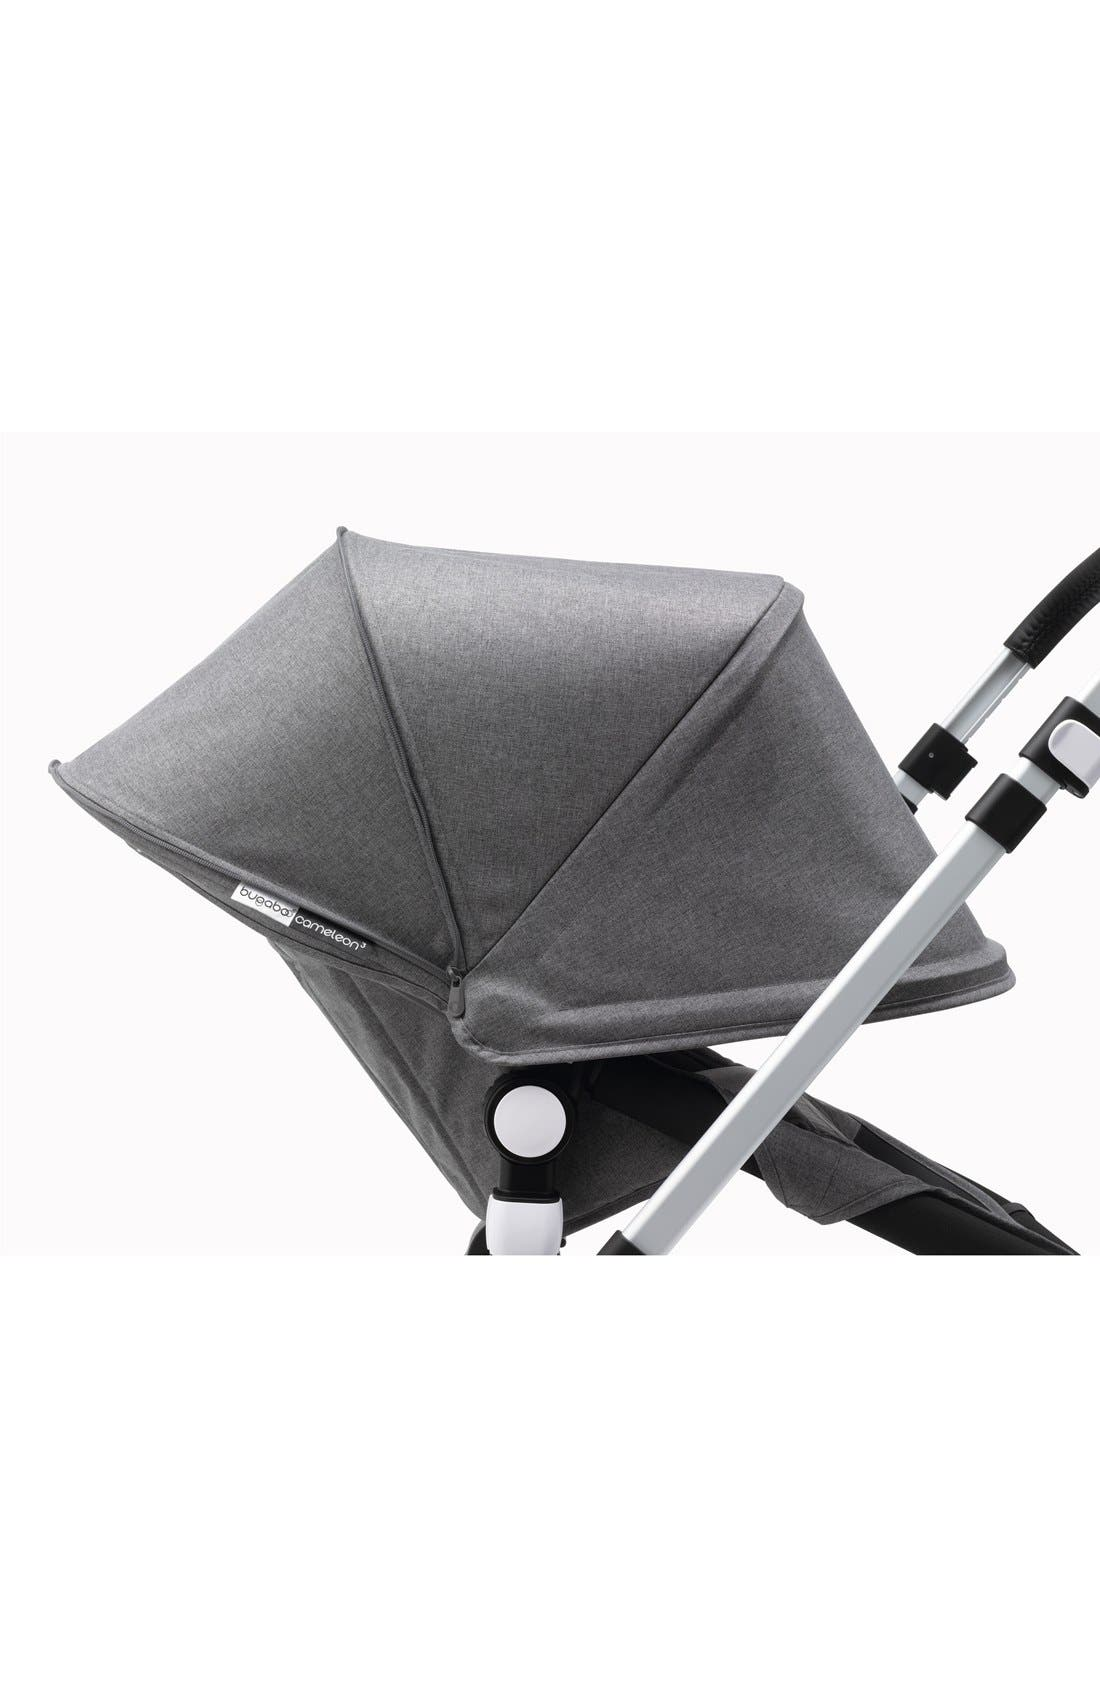 'Cameleon³' Aluminum Frame Stroller with Fabric Set,                             Alternate thumbnail 4, color,                             025